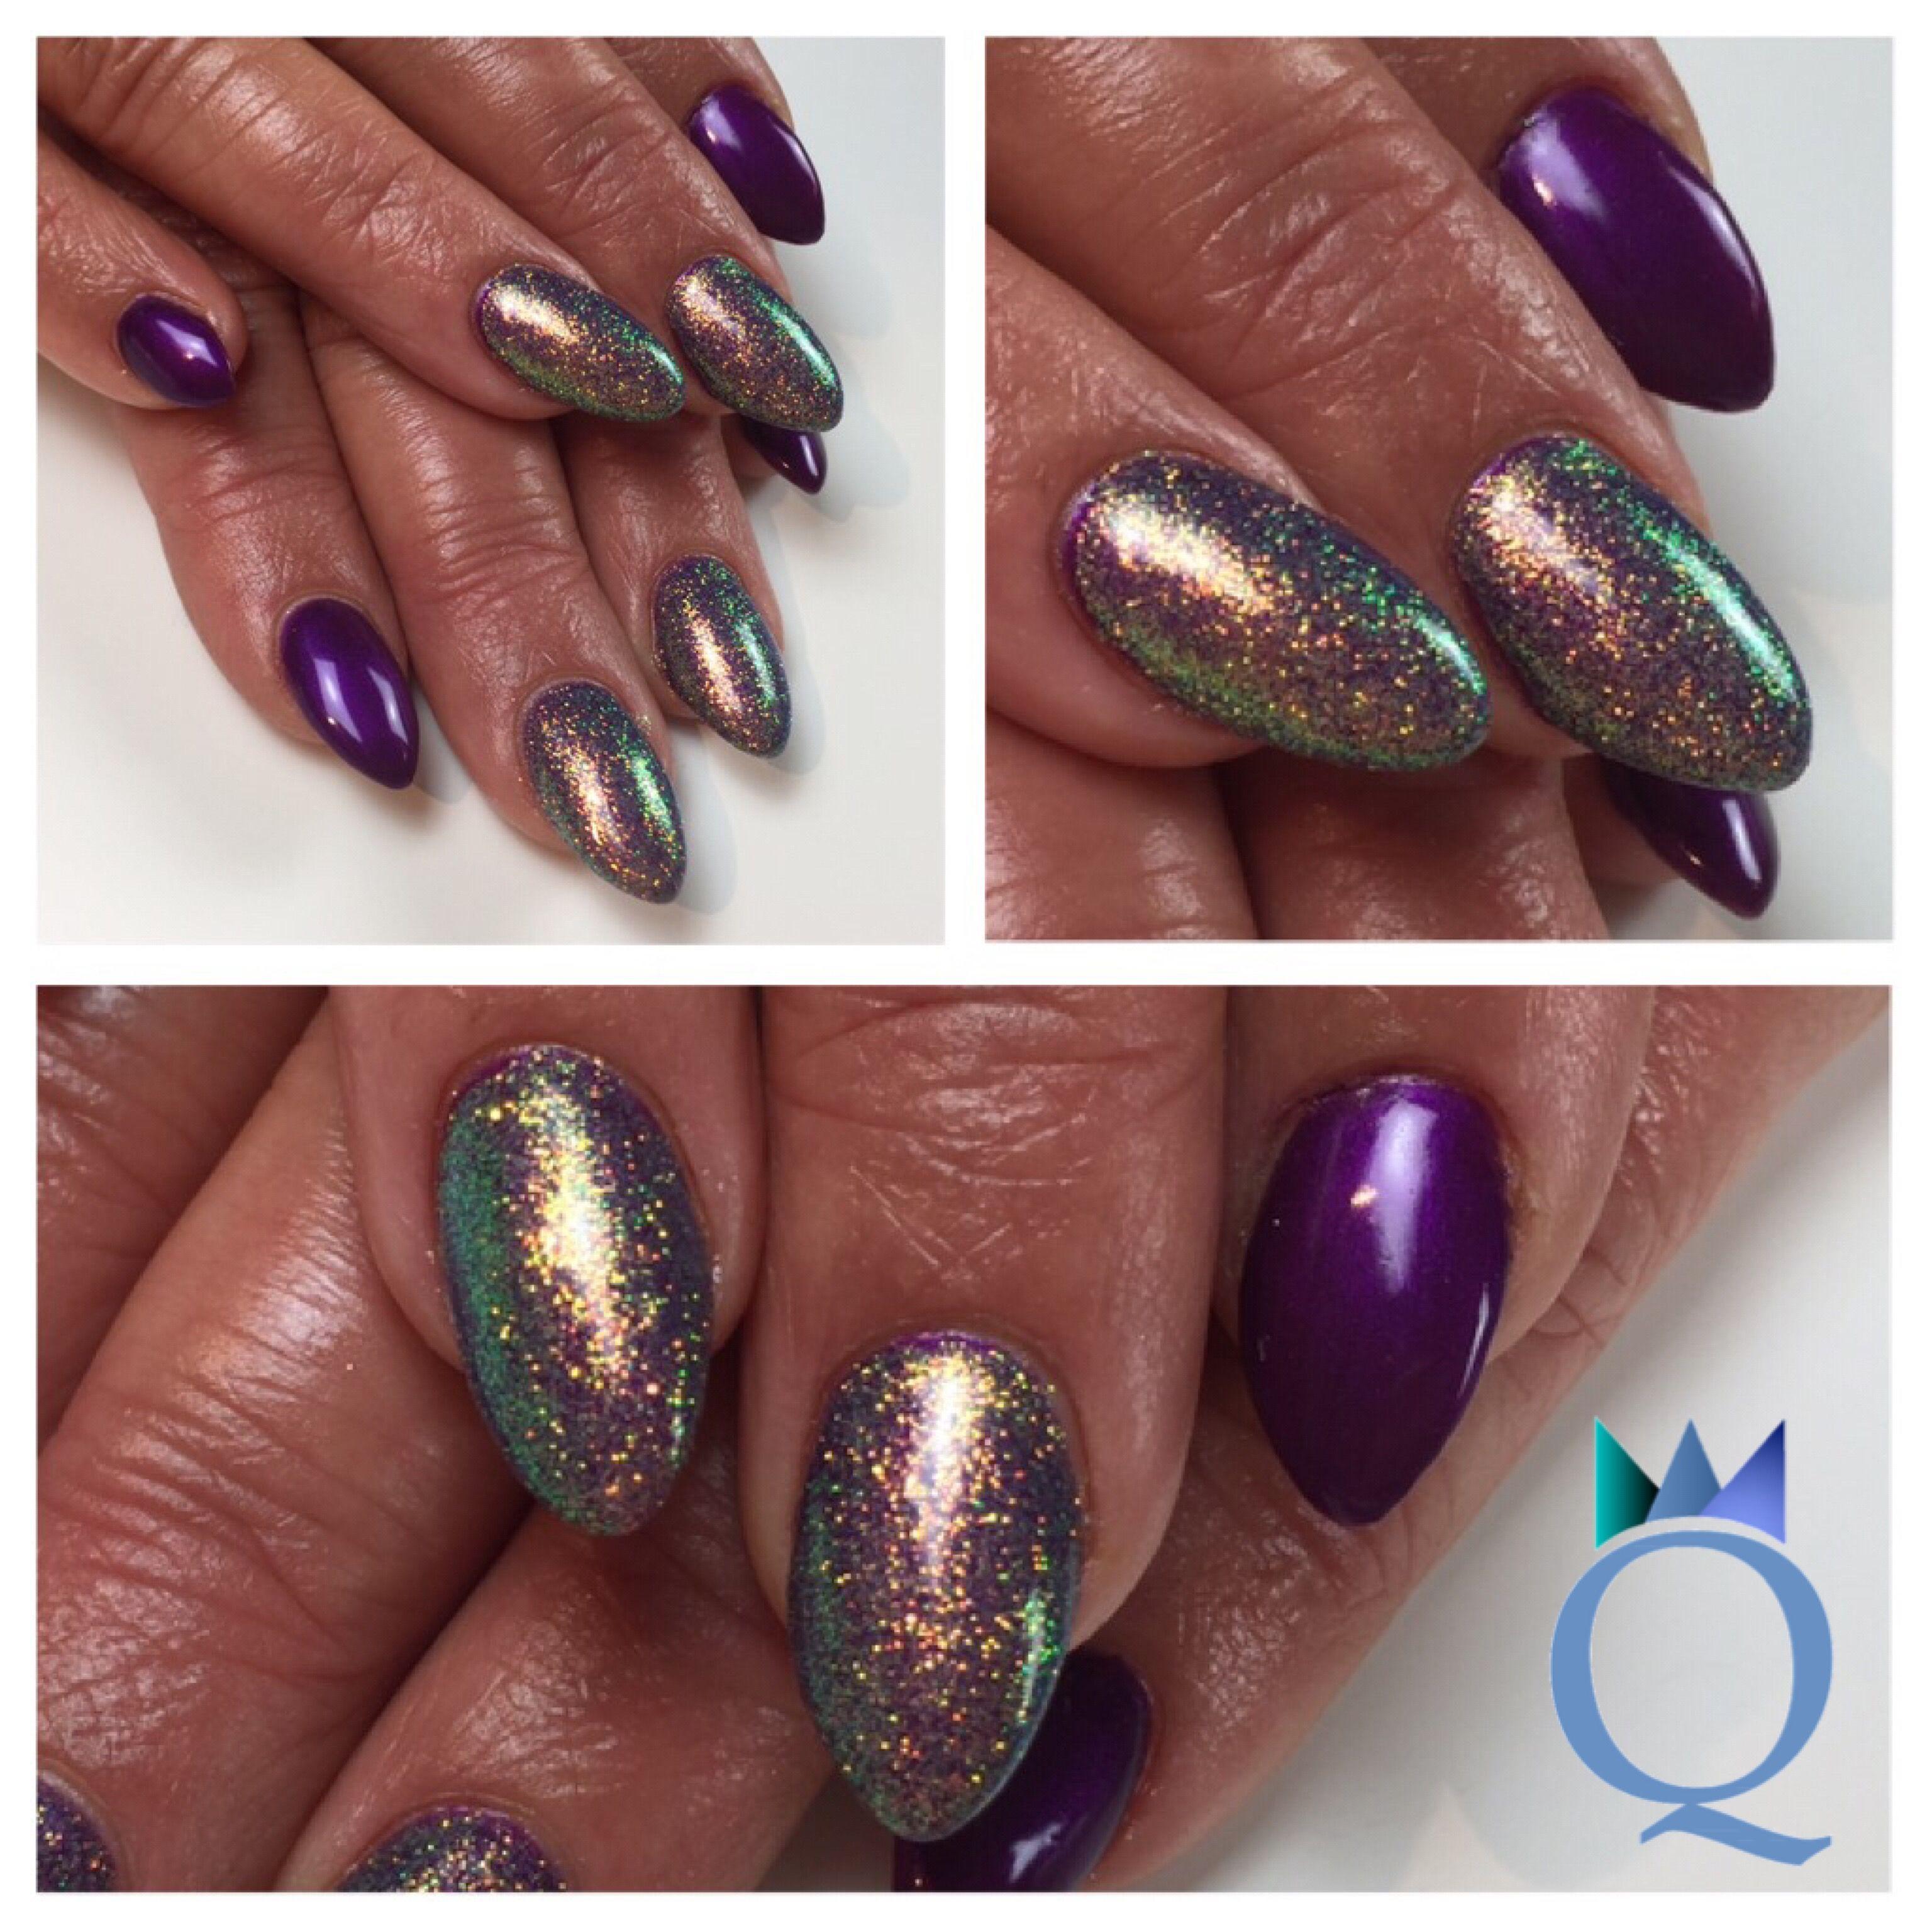 almondnails #almond #gelnails #nails #purple #mermaidpigment ...